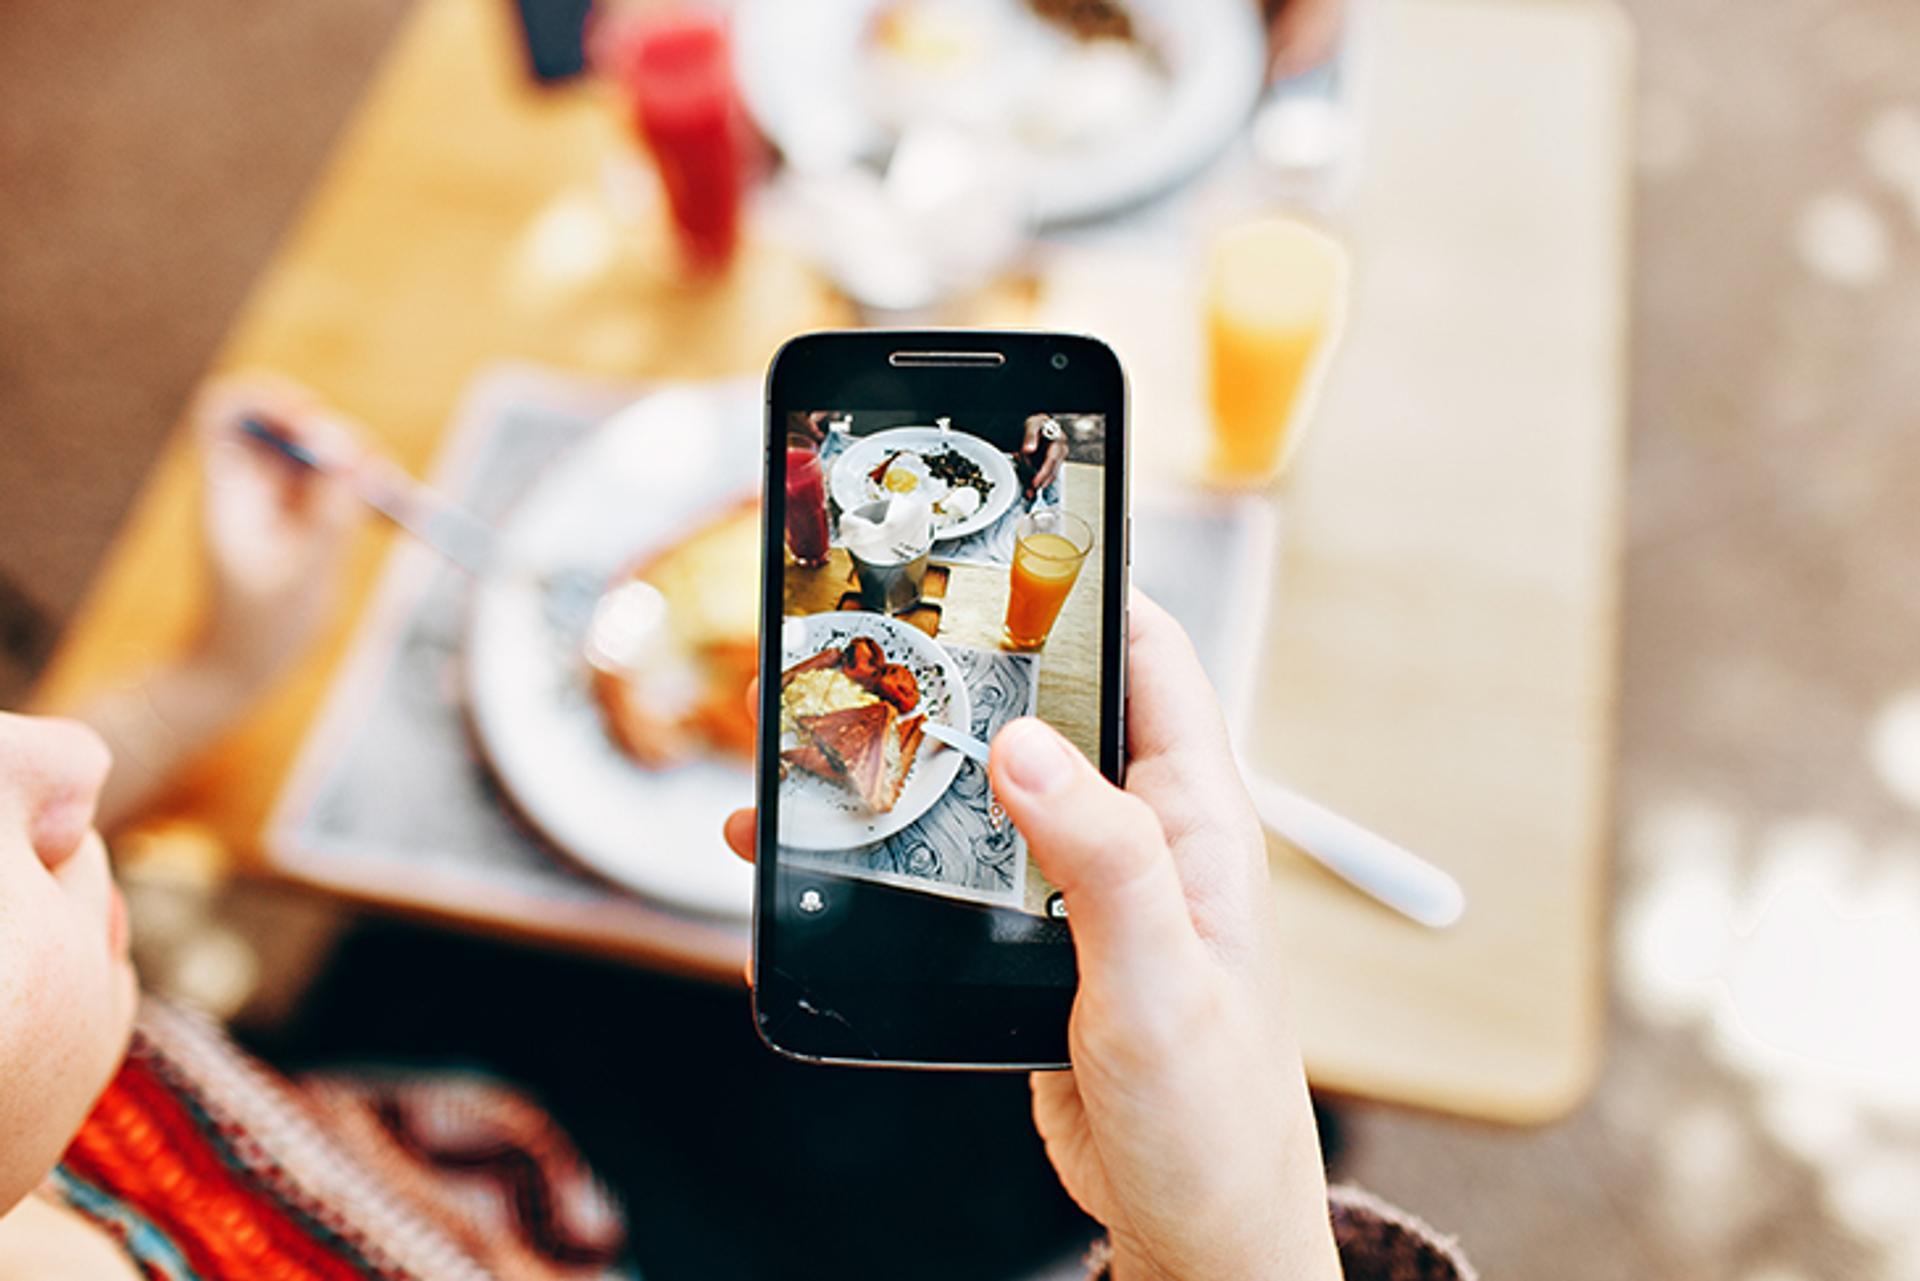 Giving Restaurant Customers Free Wifi